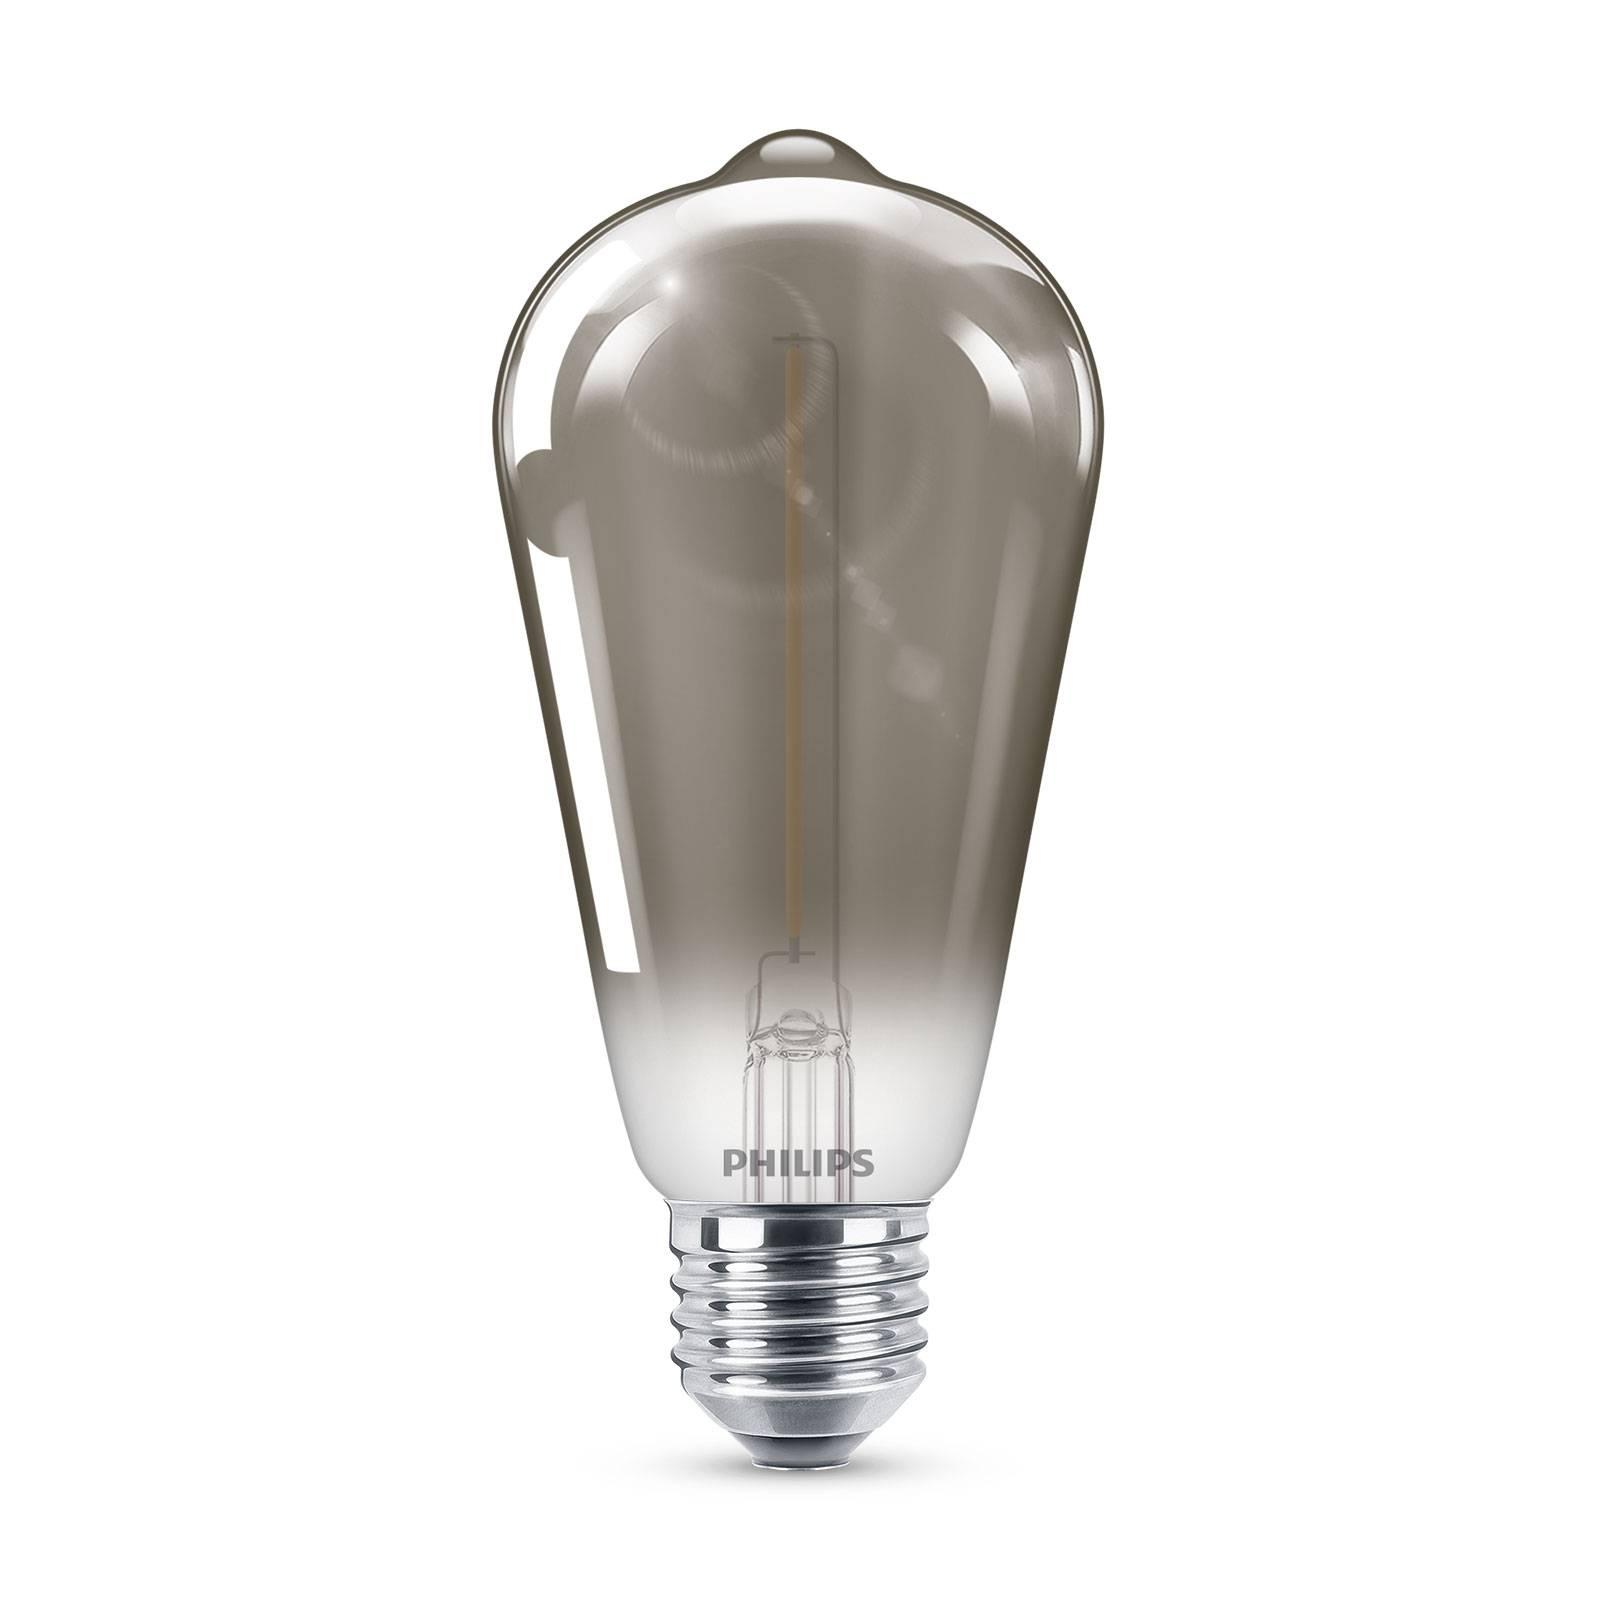 Philips Classic LED-lamppu smoky E27 ST64 2,3W